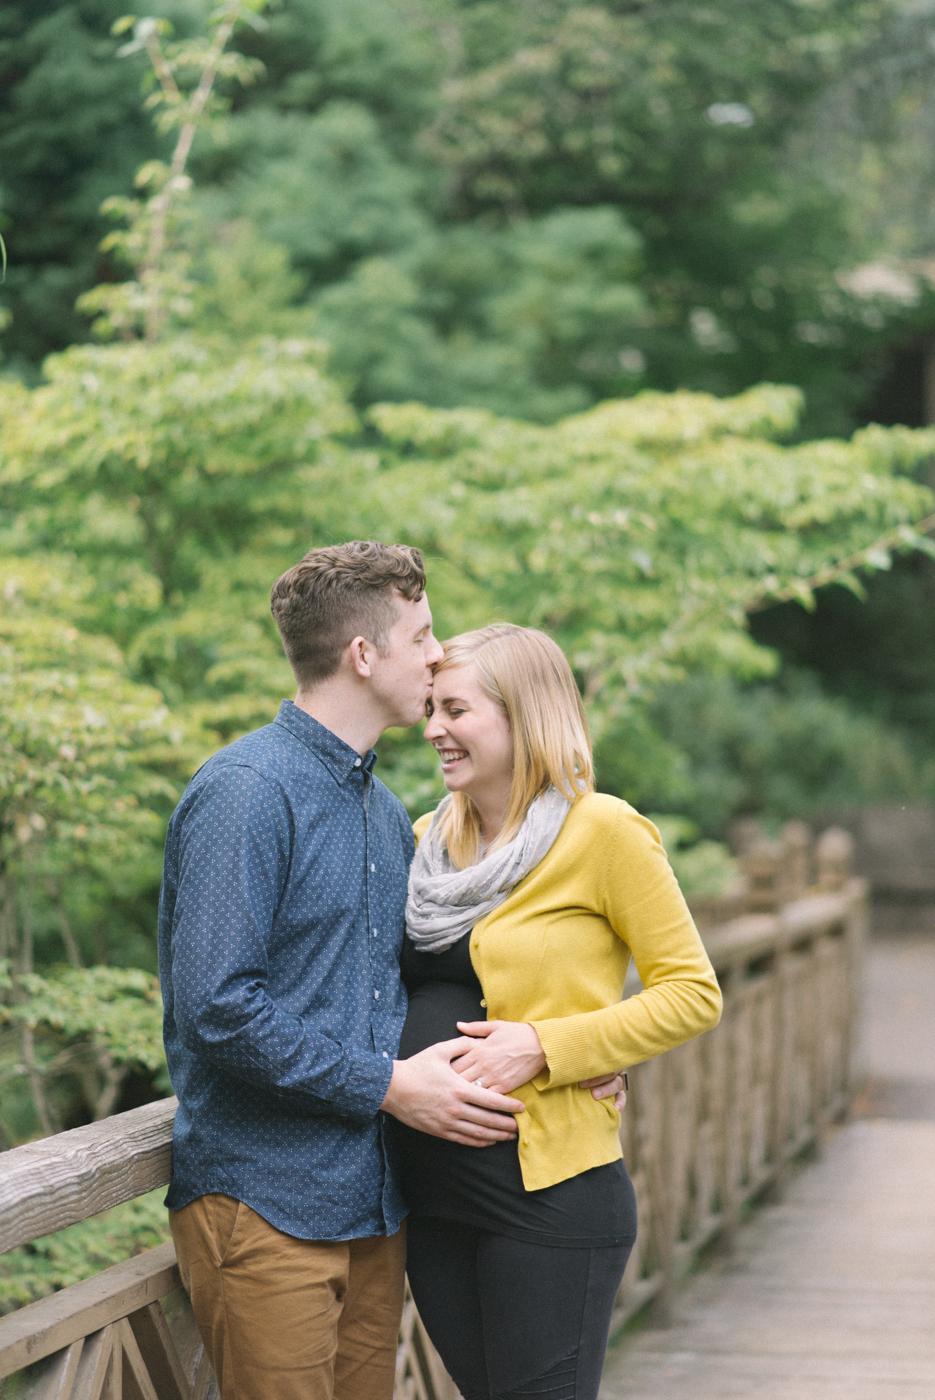 portland-oregon-maternity-photography-pregnancy-crystal-springs-rhododendron-garden-kiss-bridge-laugh-sweet-romantic-shelley-marie-photo-3